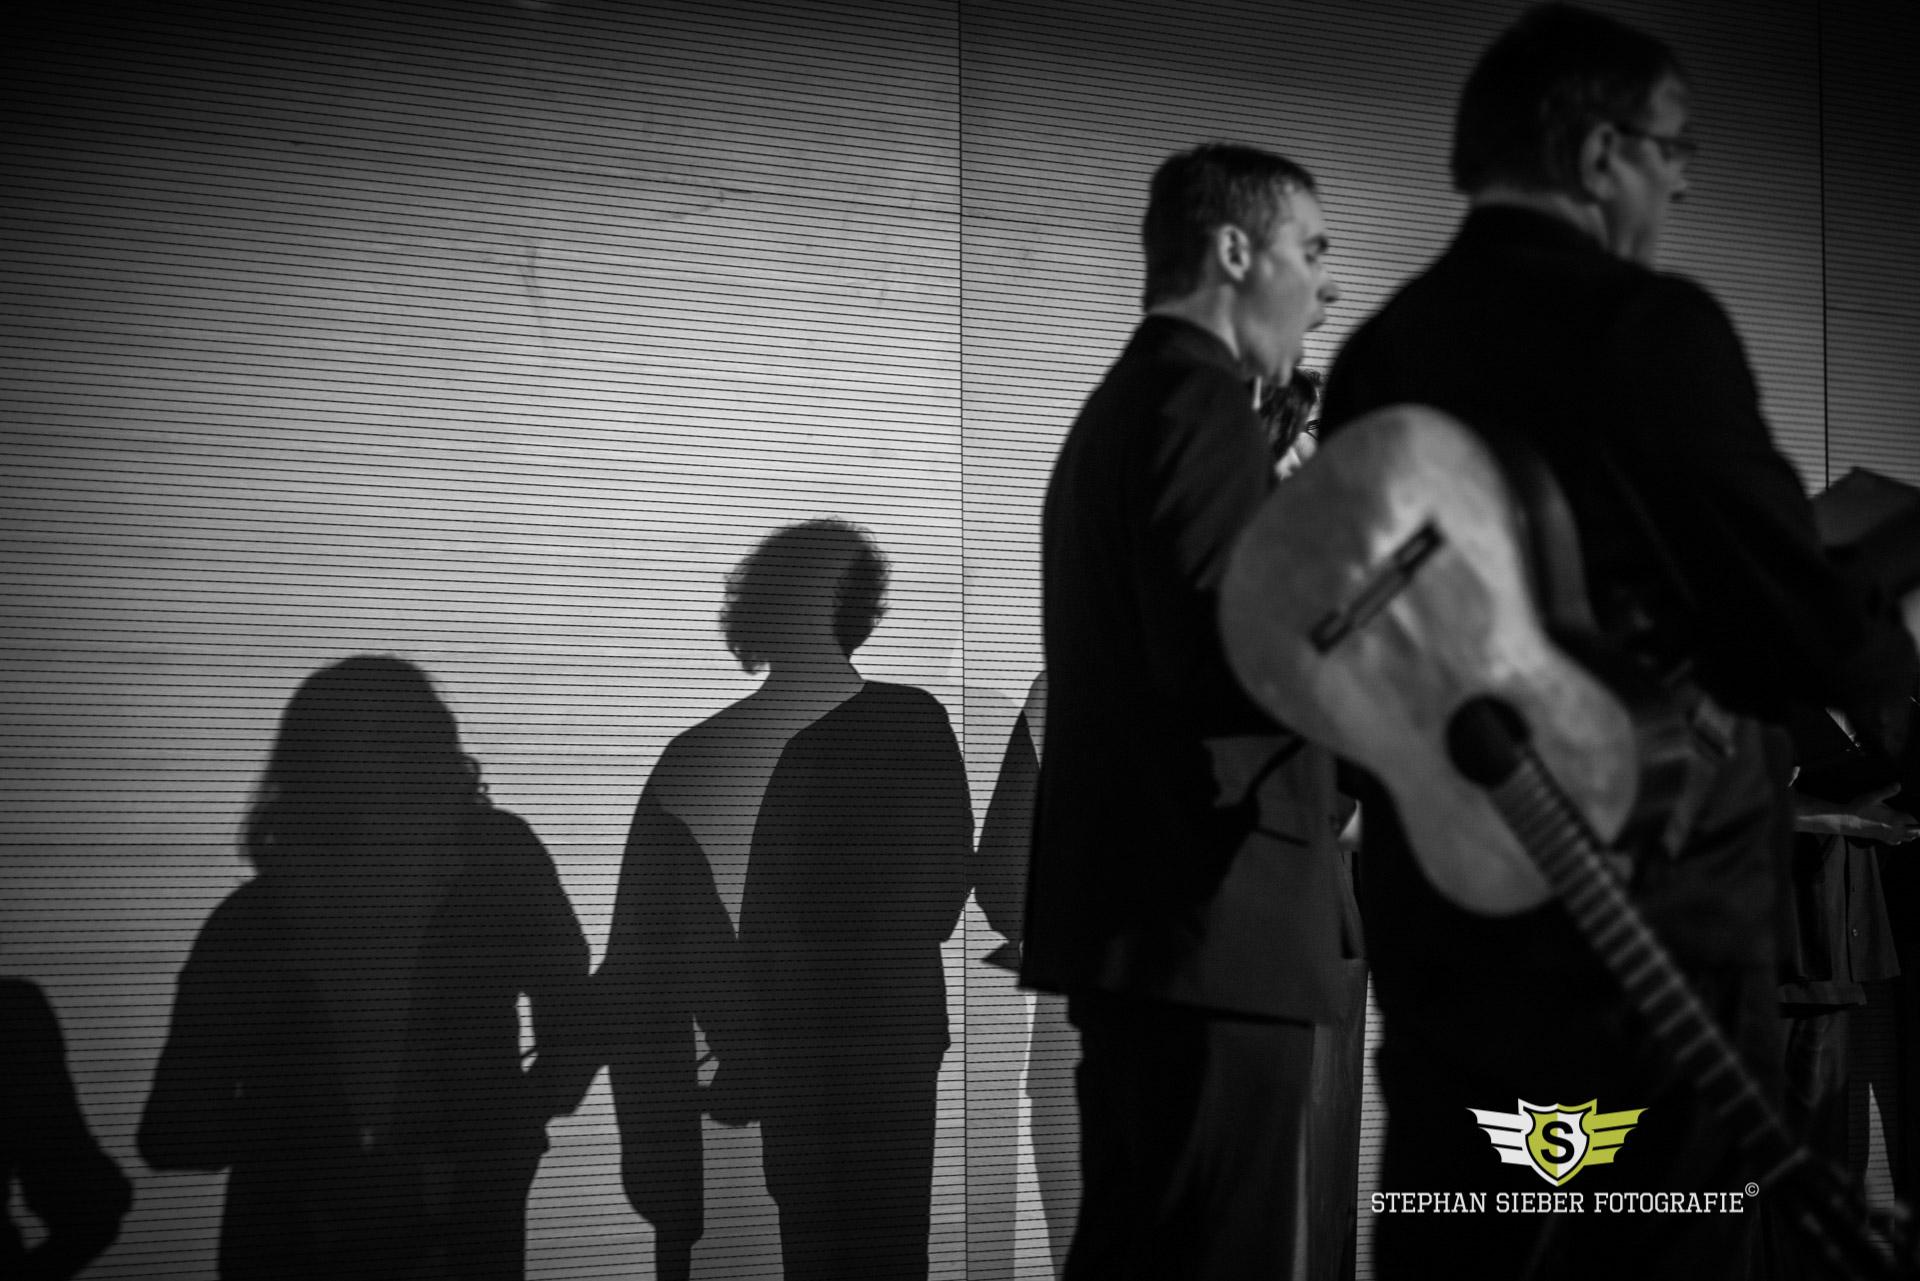 foto: stephan sieber